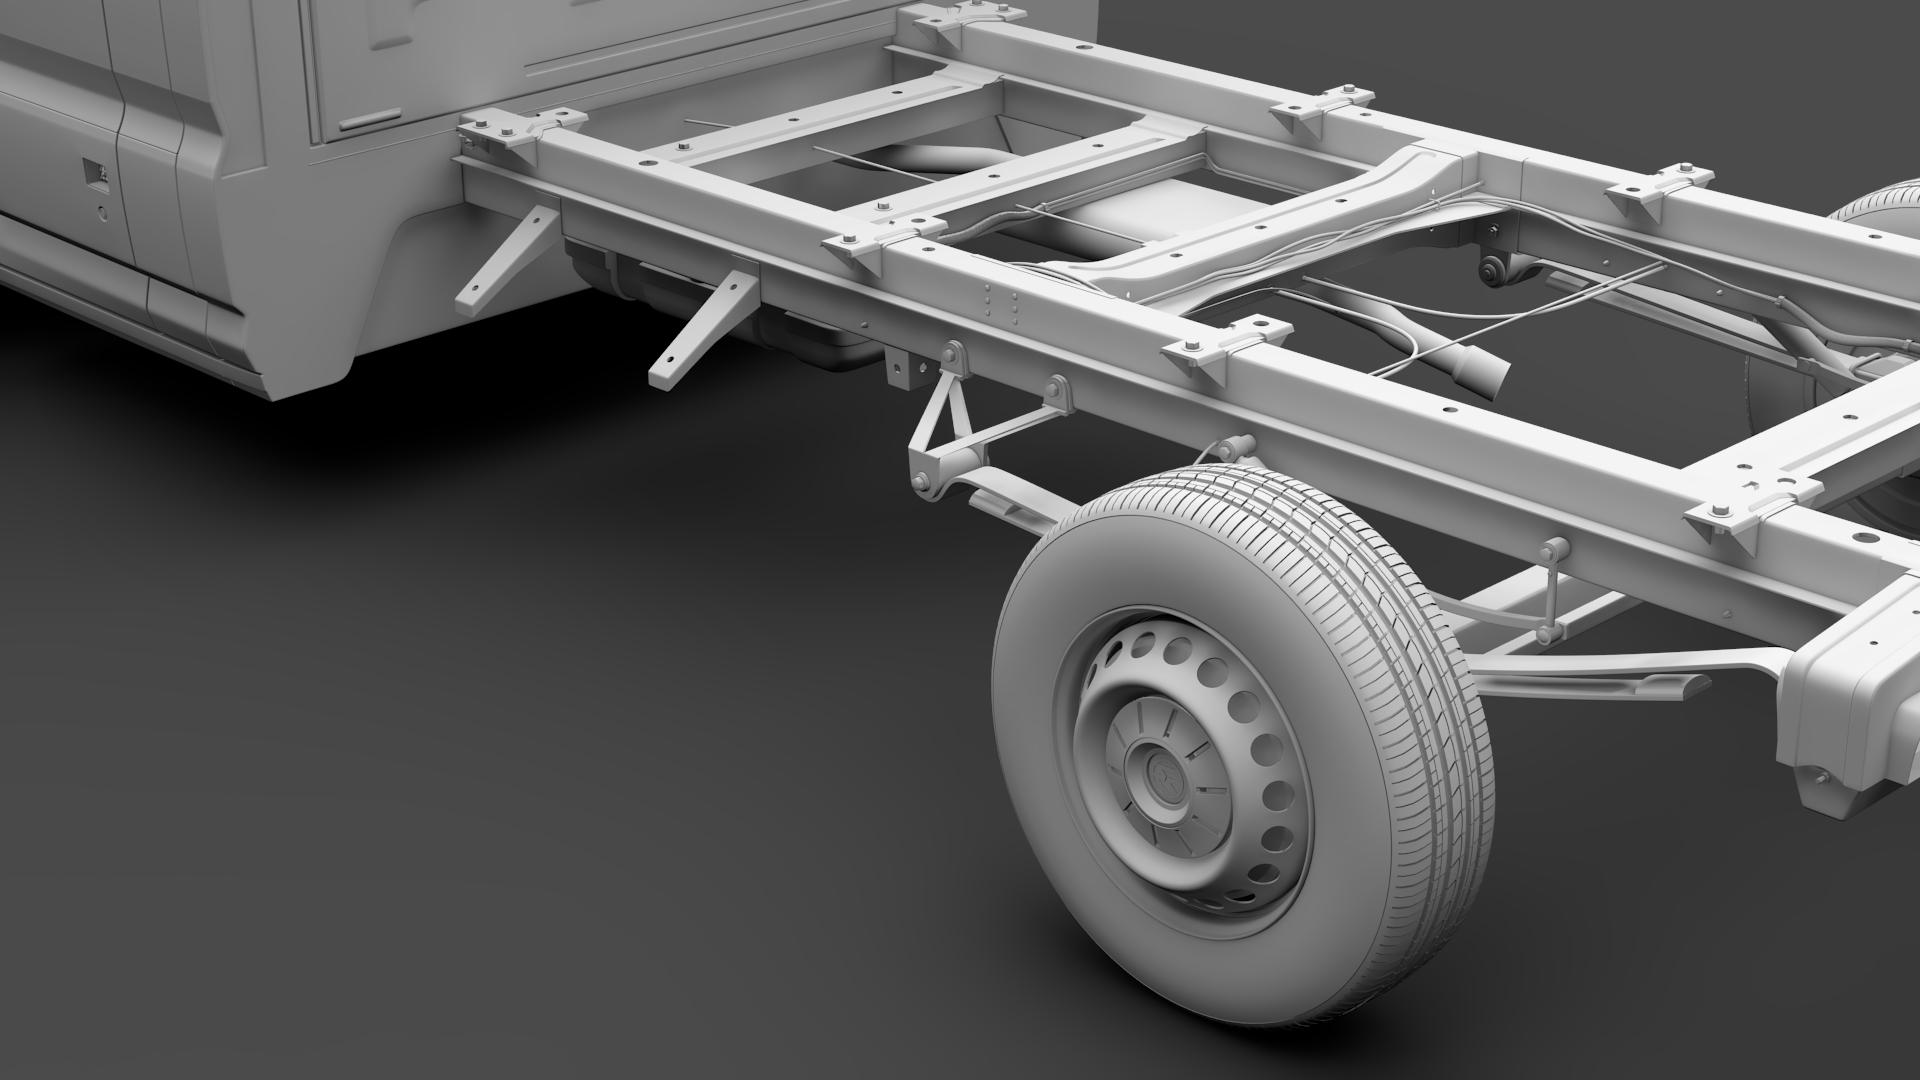 wv crafter chassis single-cab 2017 3d model max fbx c4d lwo ma mb hrc xsi obj 275103